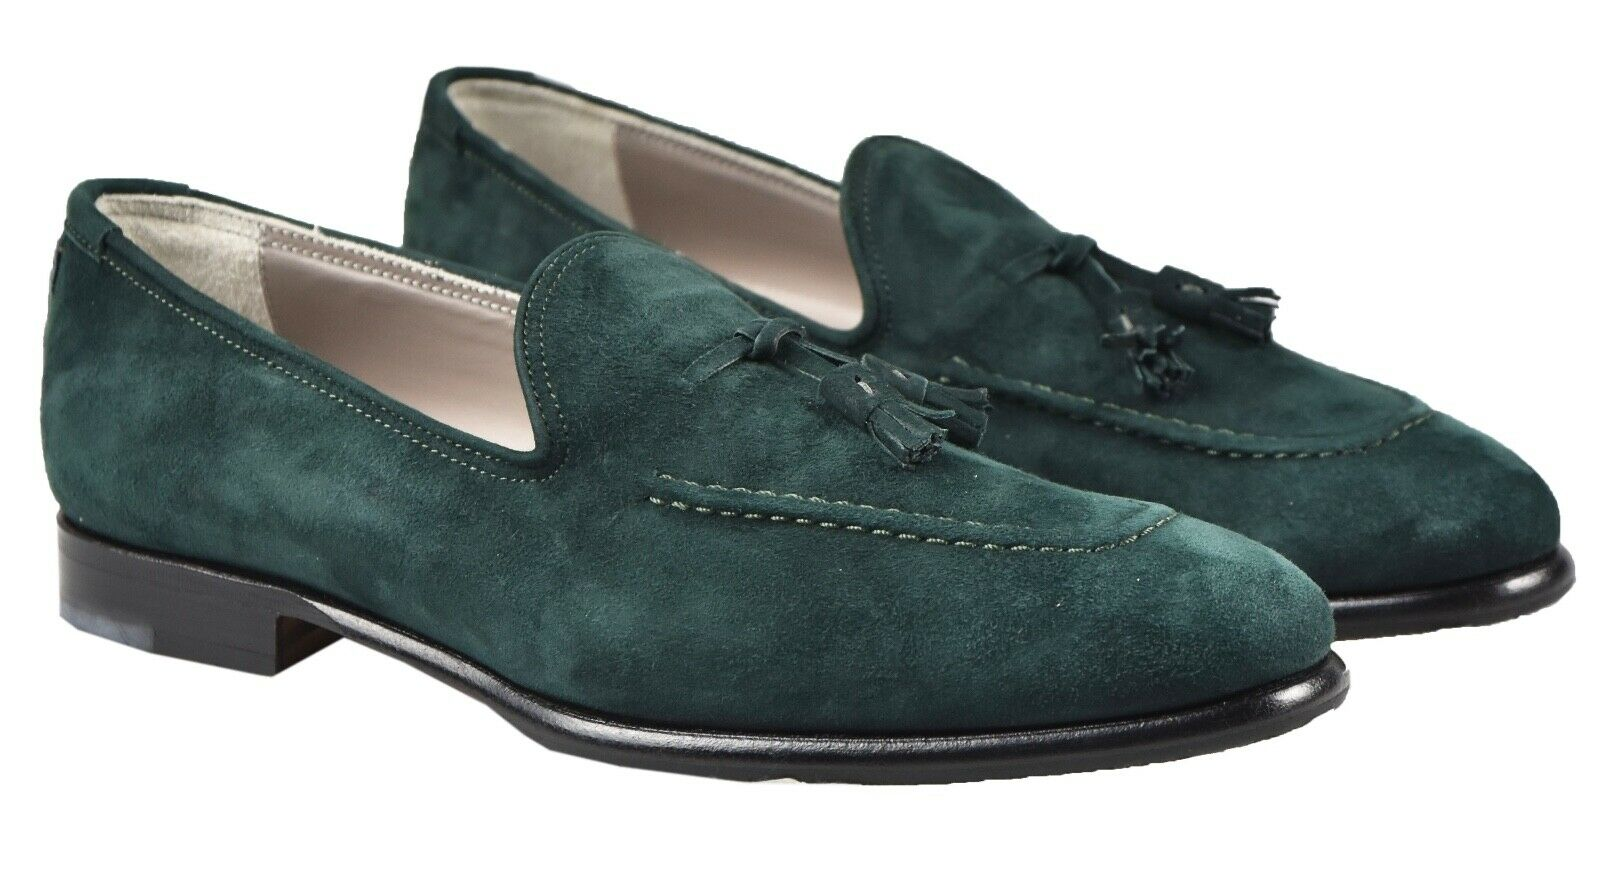 NEW KITON DRESS scarpe 100% LEATHER SZ 10 US 43 EU 19O109